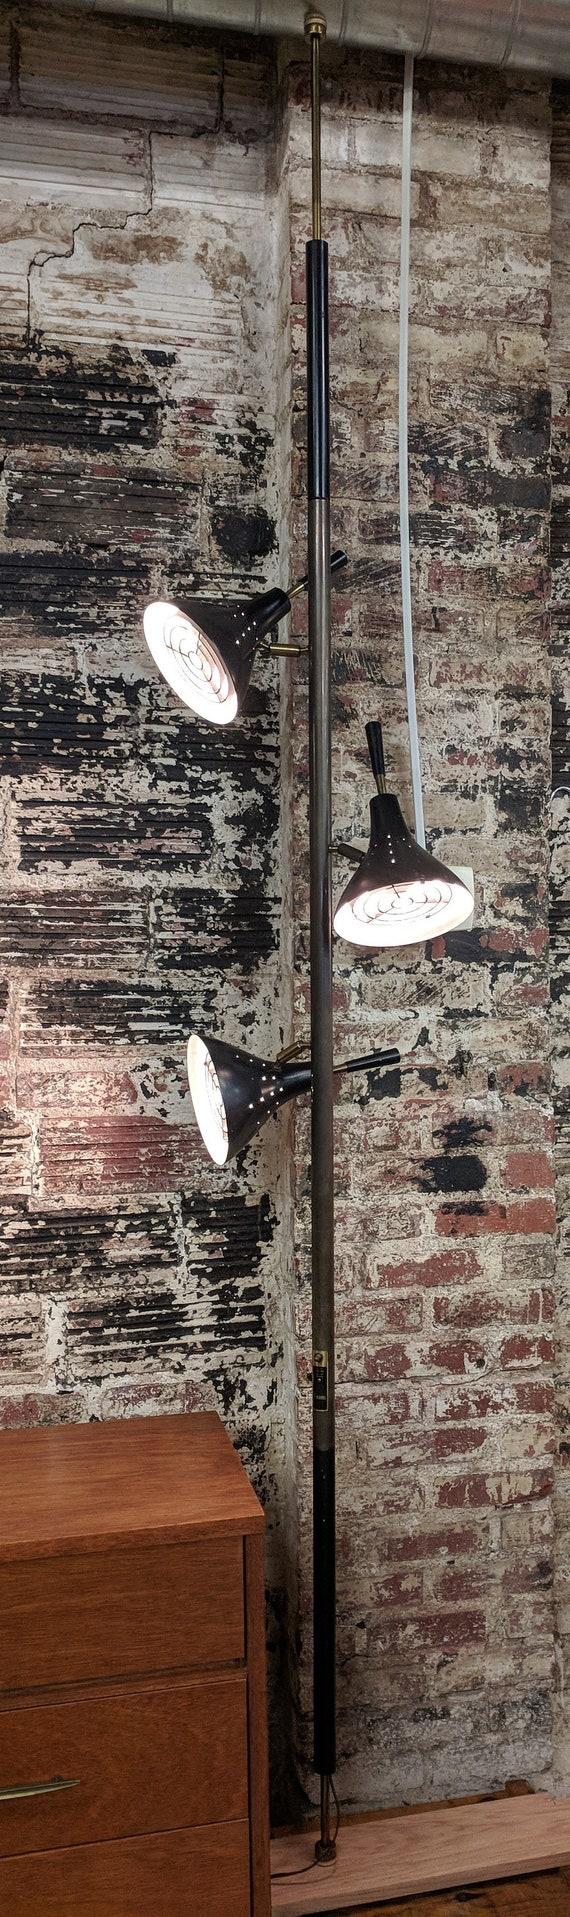 Mid Century Modern Stiffel Extension Pole Lamp